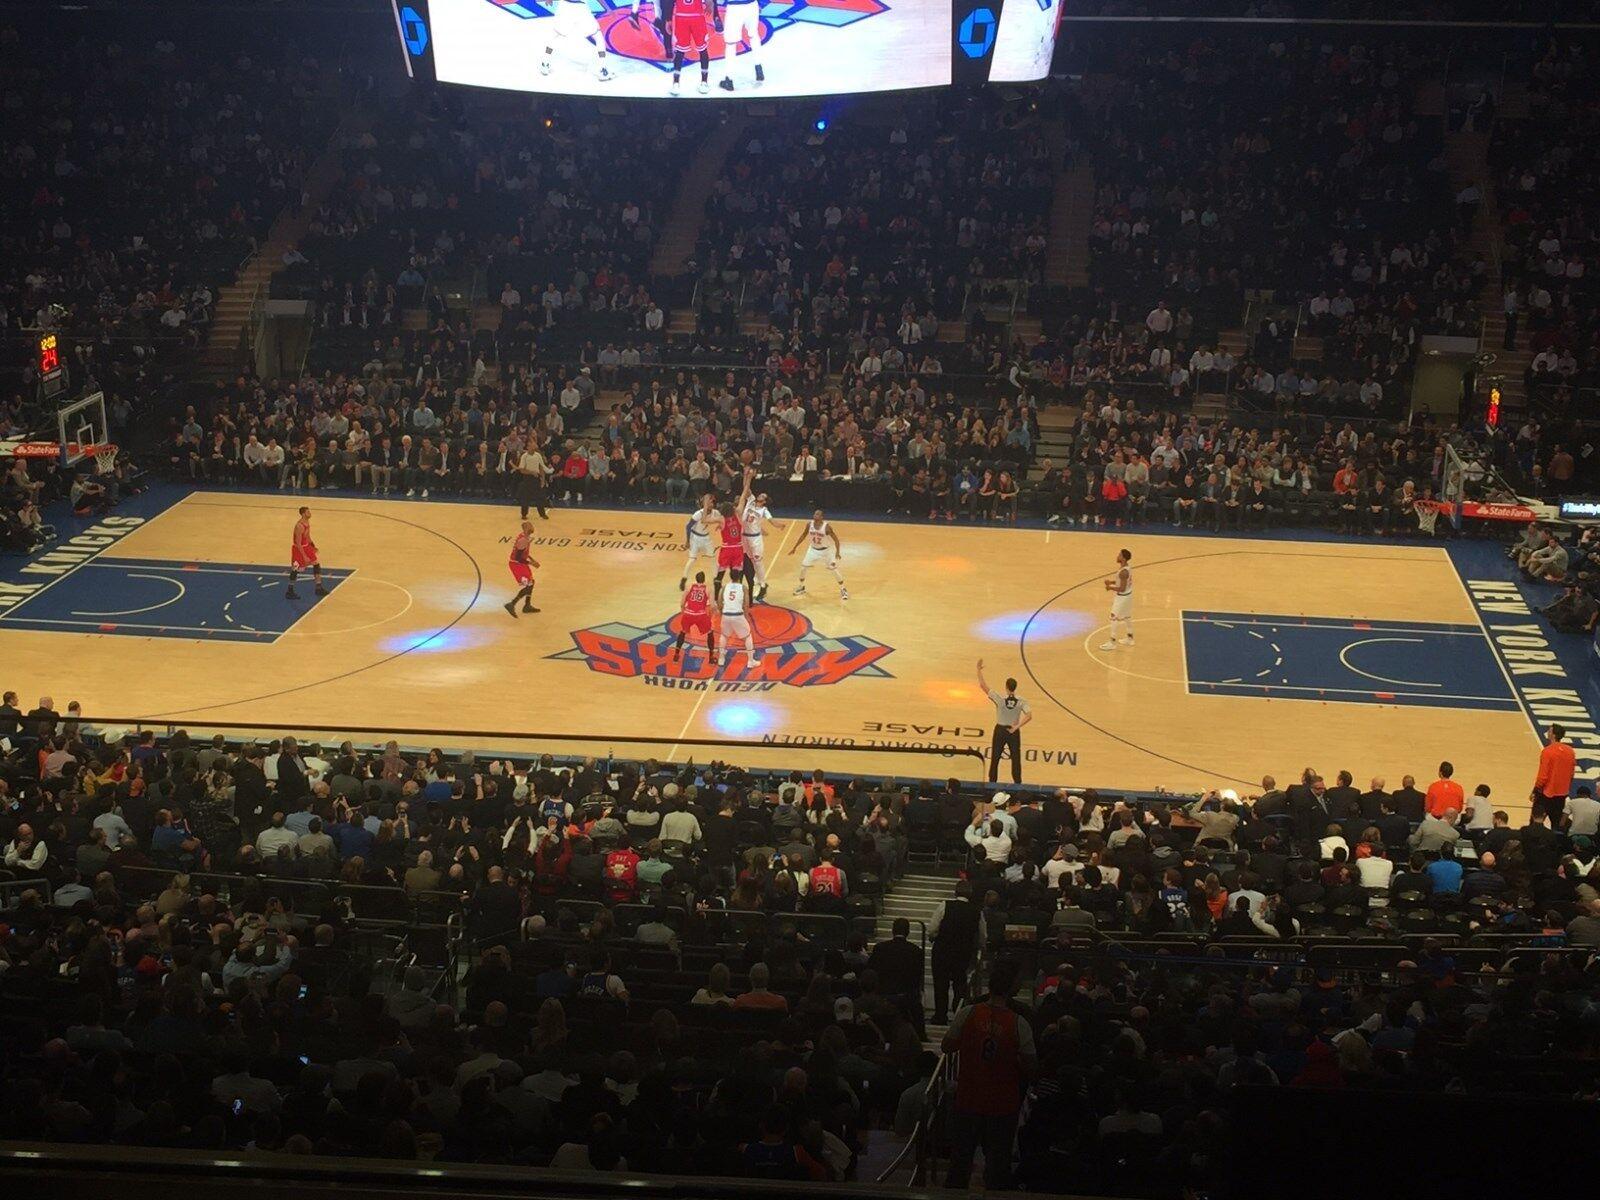 Купить 2/5/19 - 2 tickets - KNICKS/Pistons, Sec 212, row 3 on aisle, center court